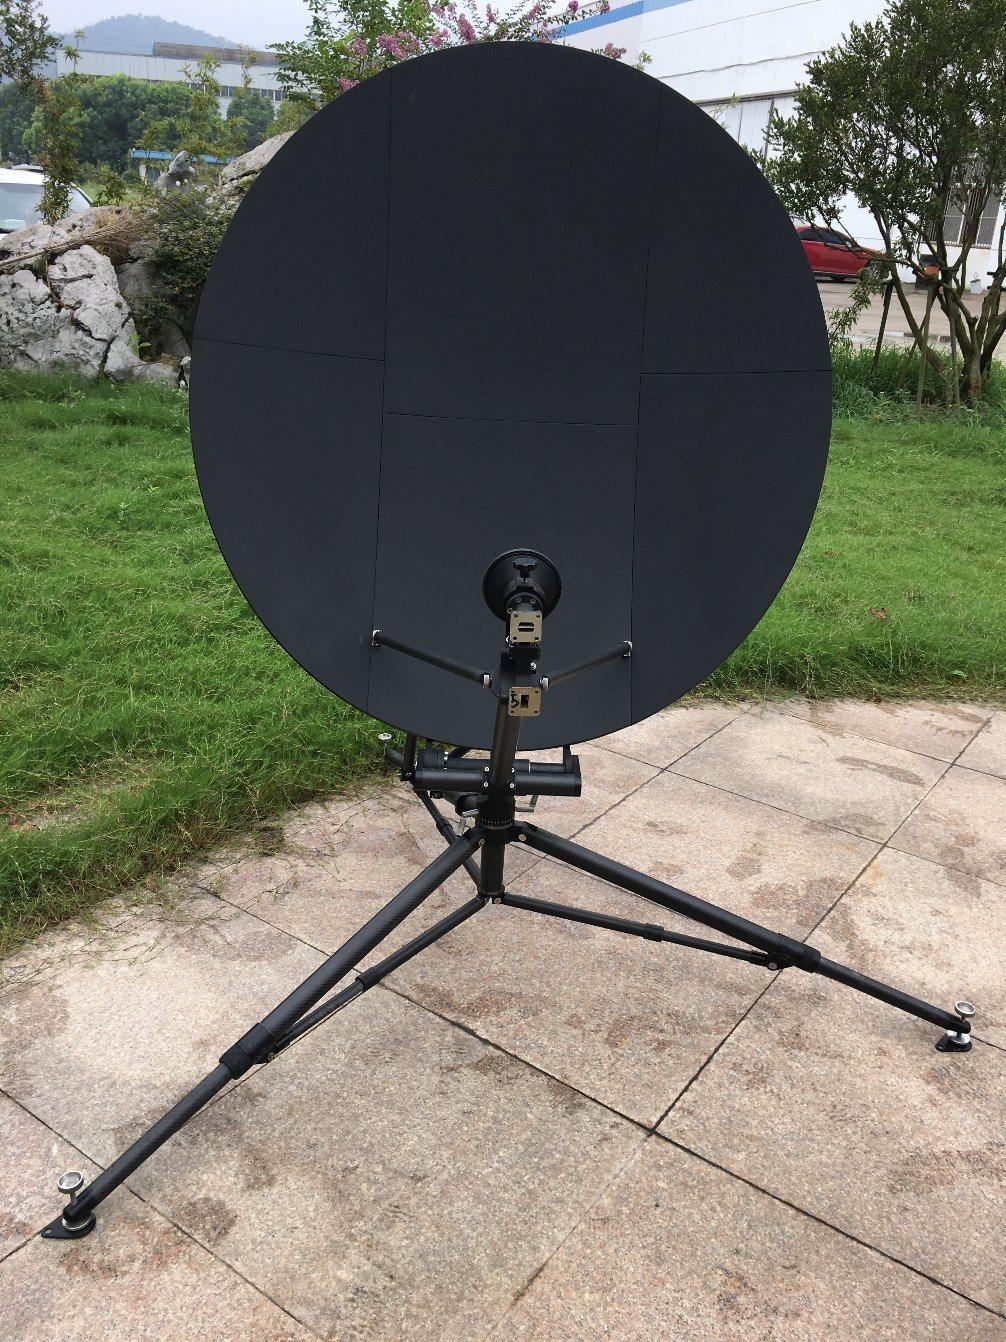 1.2m Full Carbon Fiber Rxtx Flyaway Satellite Dish Antenna